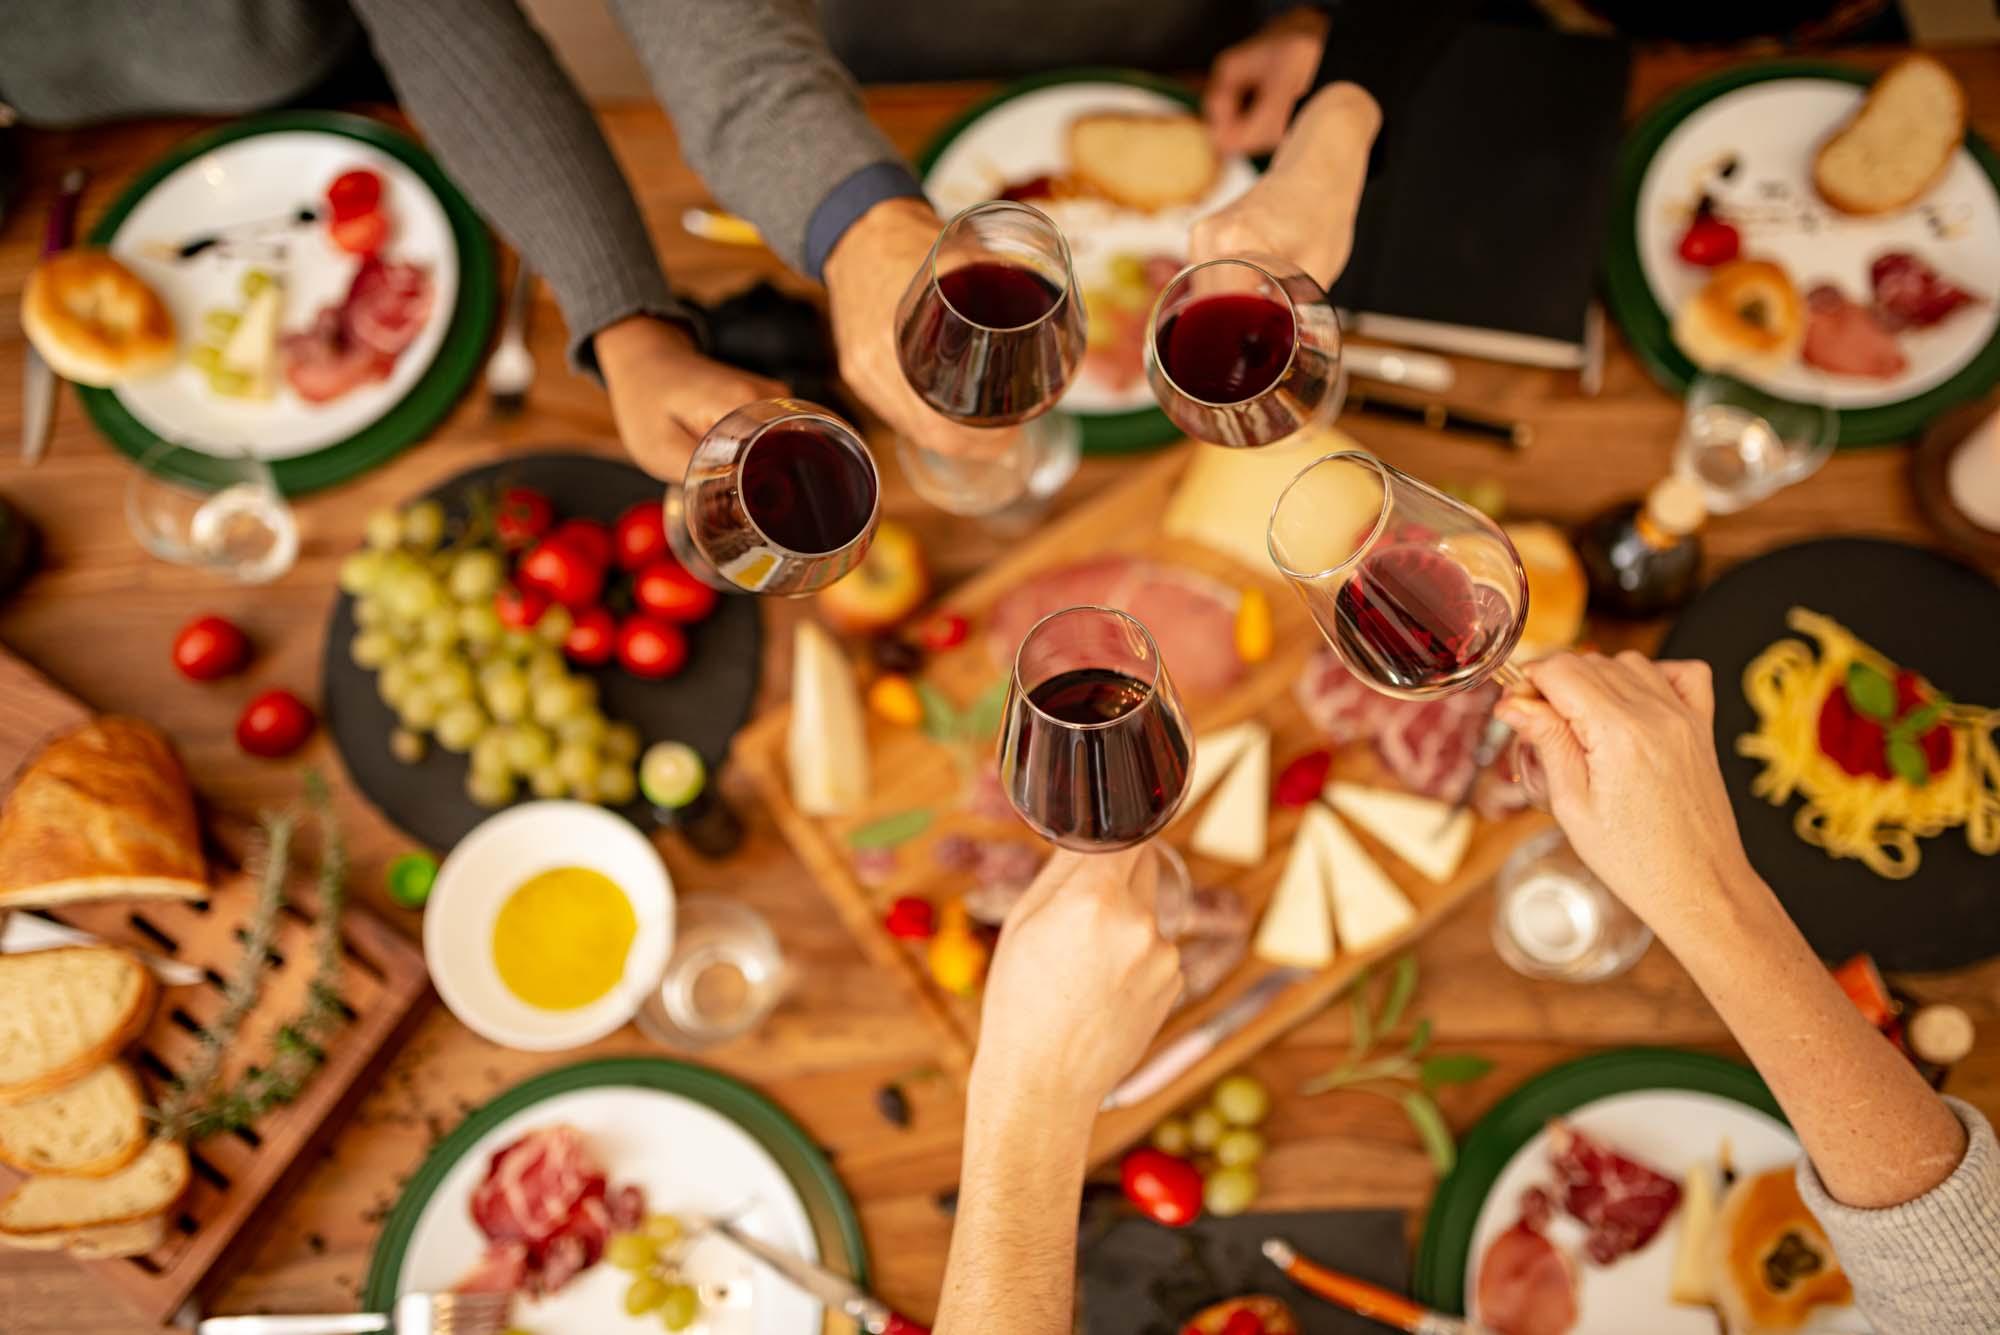 Corsi Di Cucina Cene Aziendali a Bari